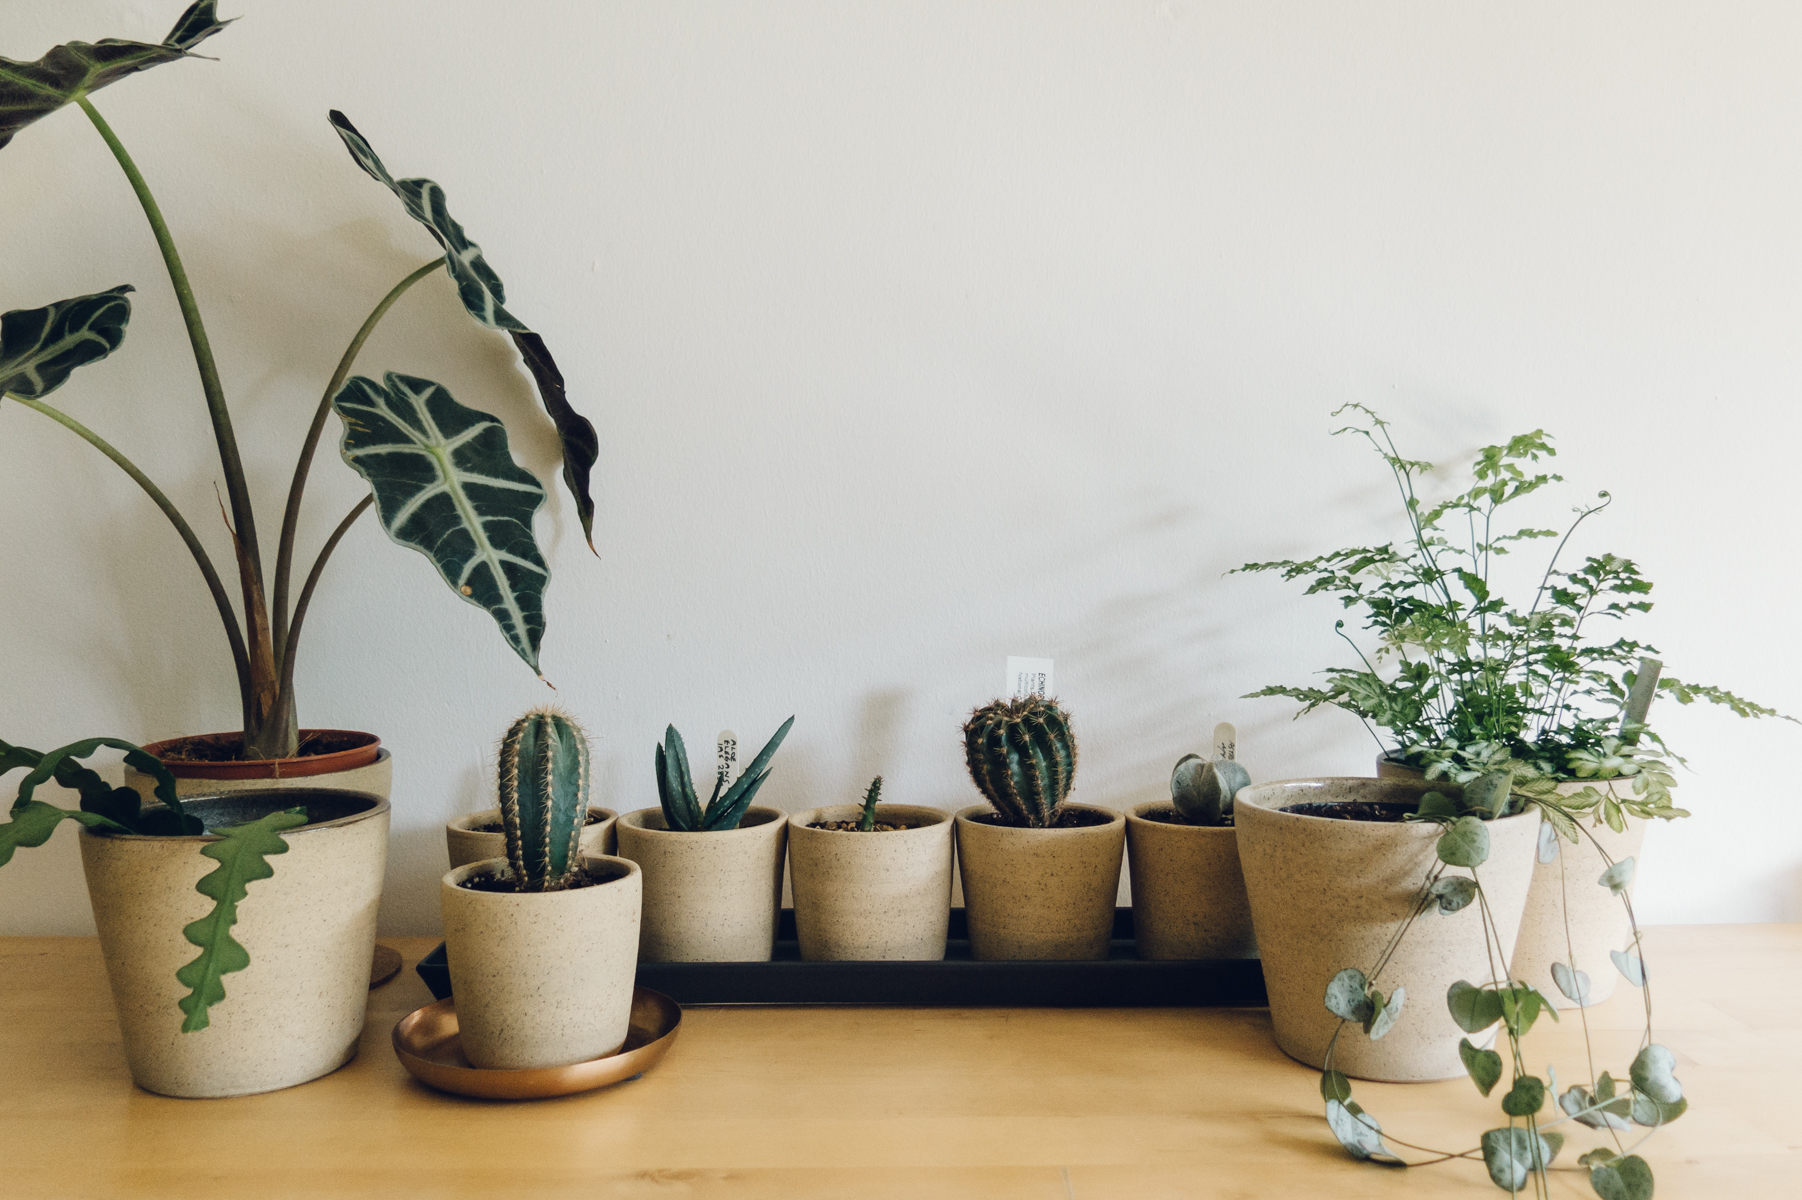 Ceramic pots with plants